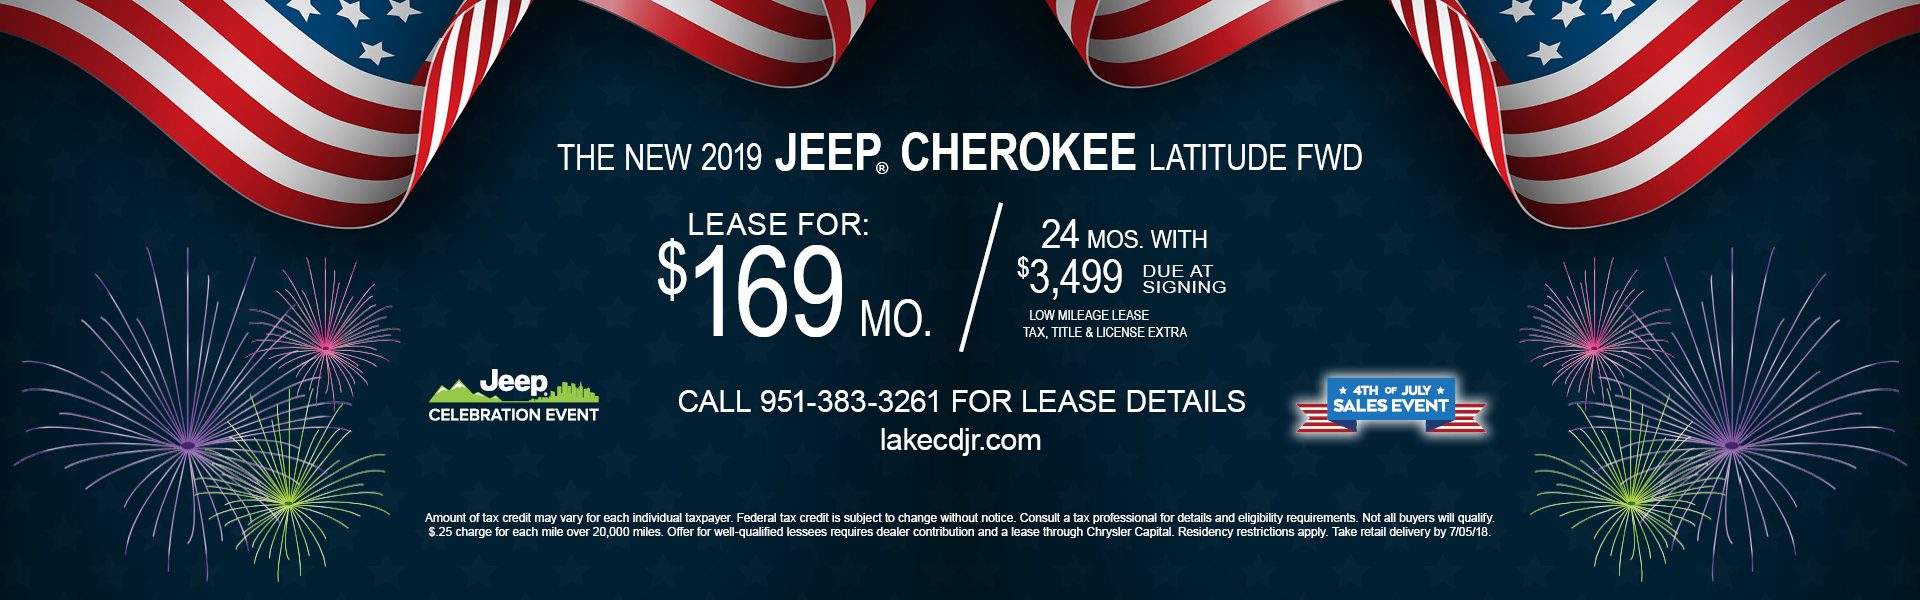 Jeep Cherokee Latitude $169 Lease